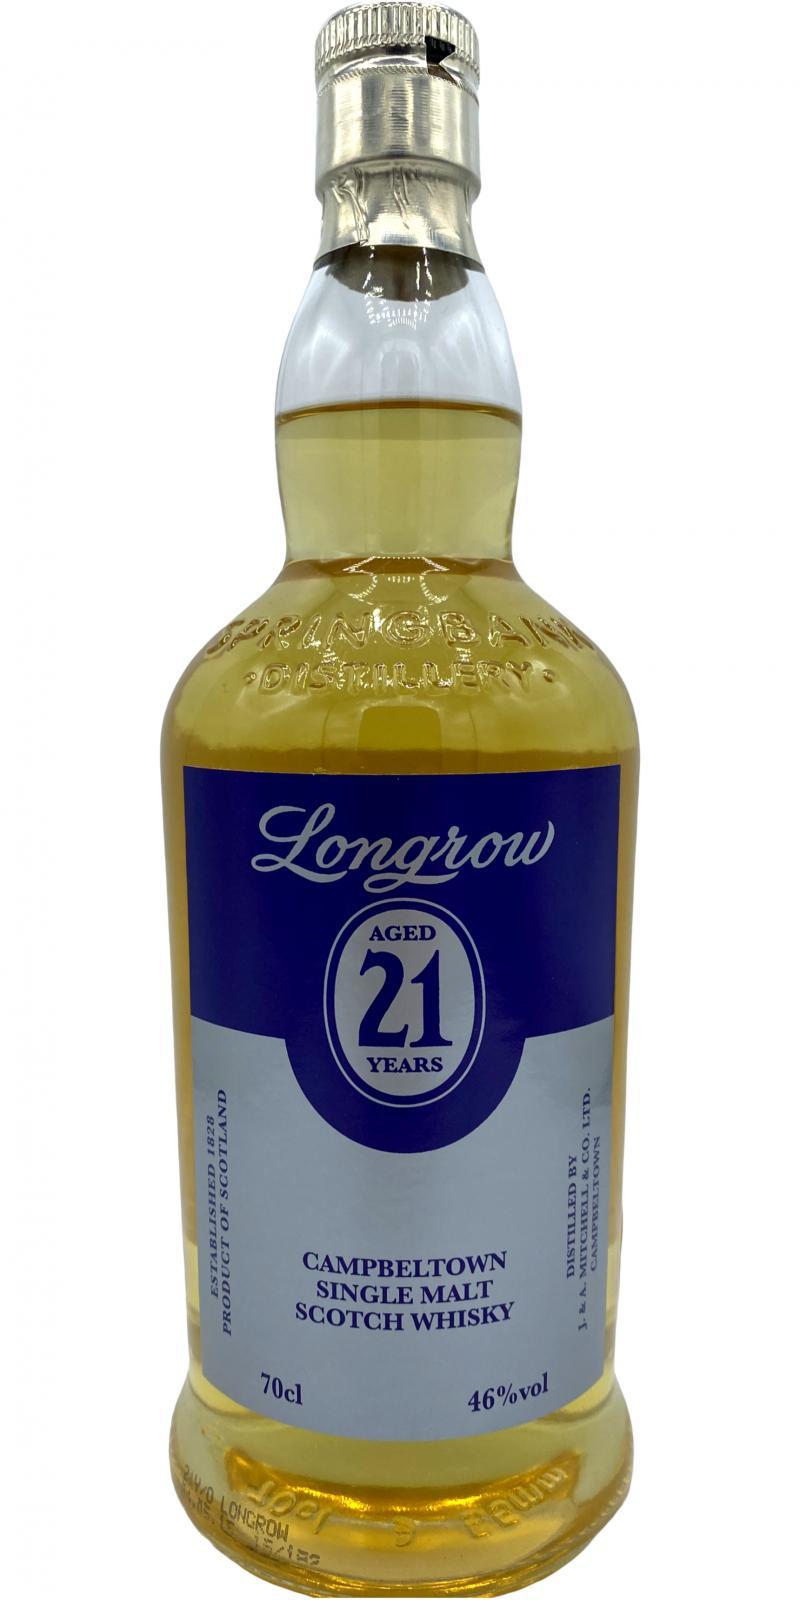 Longrow 21-year-old